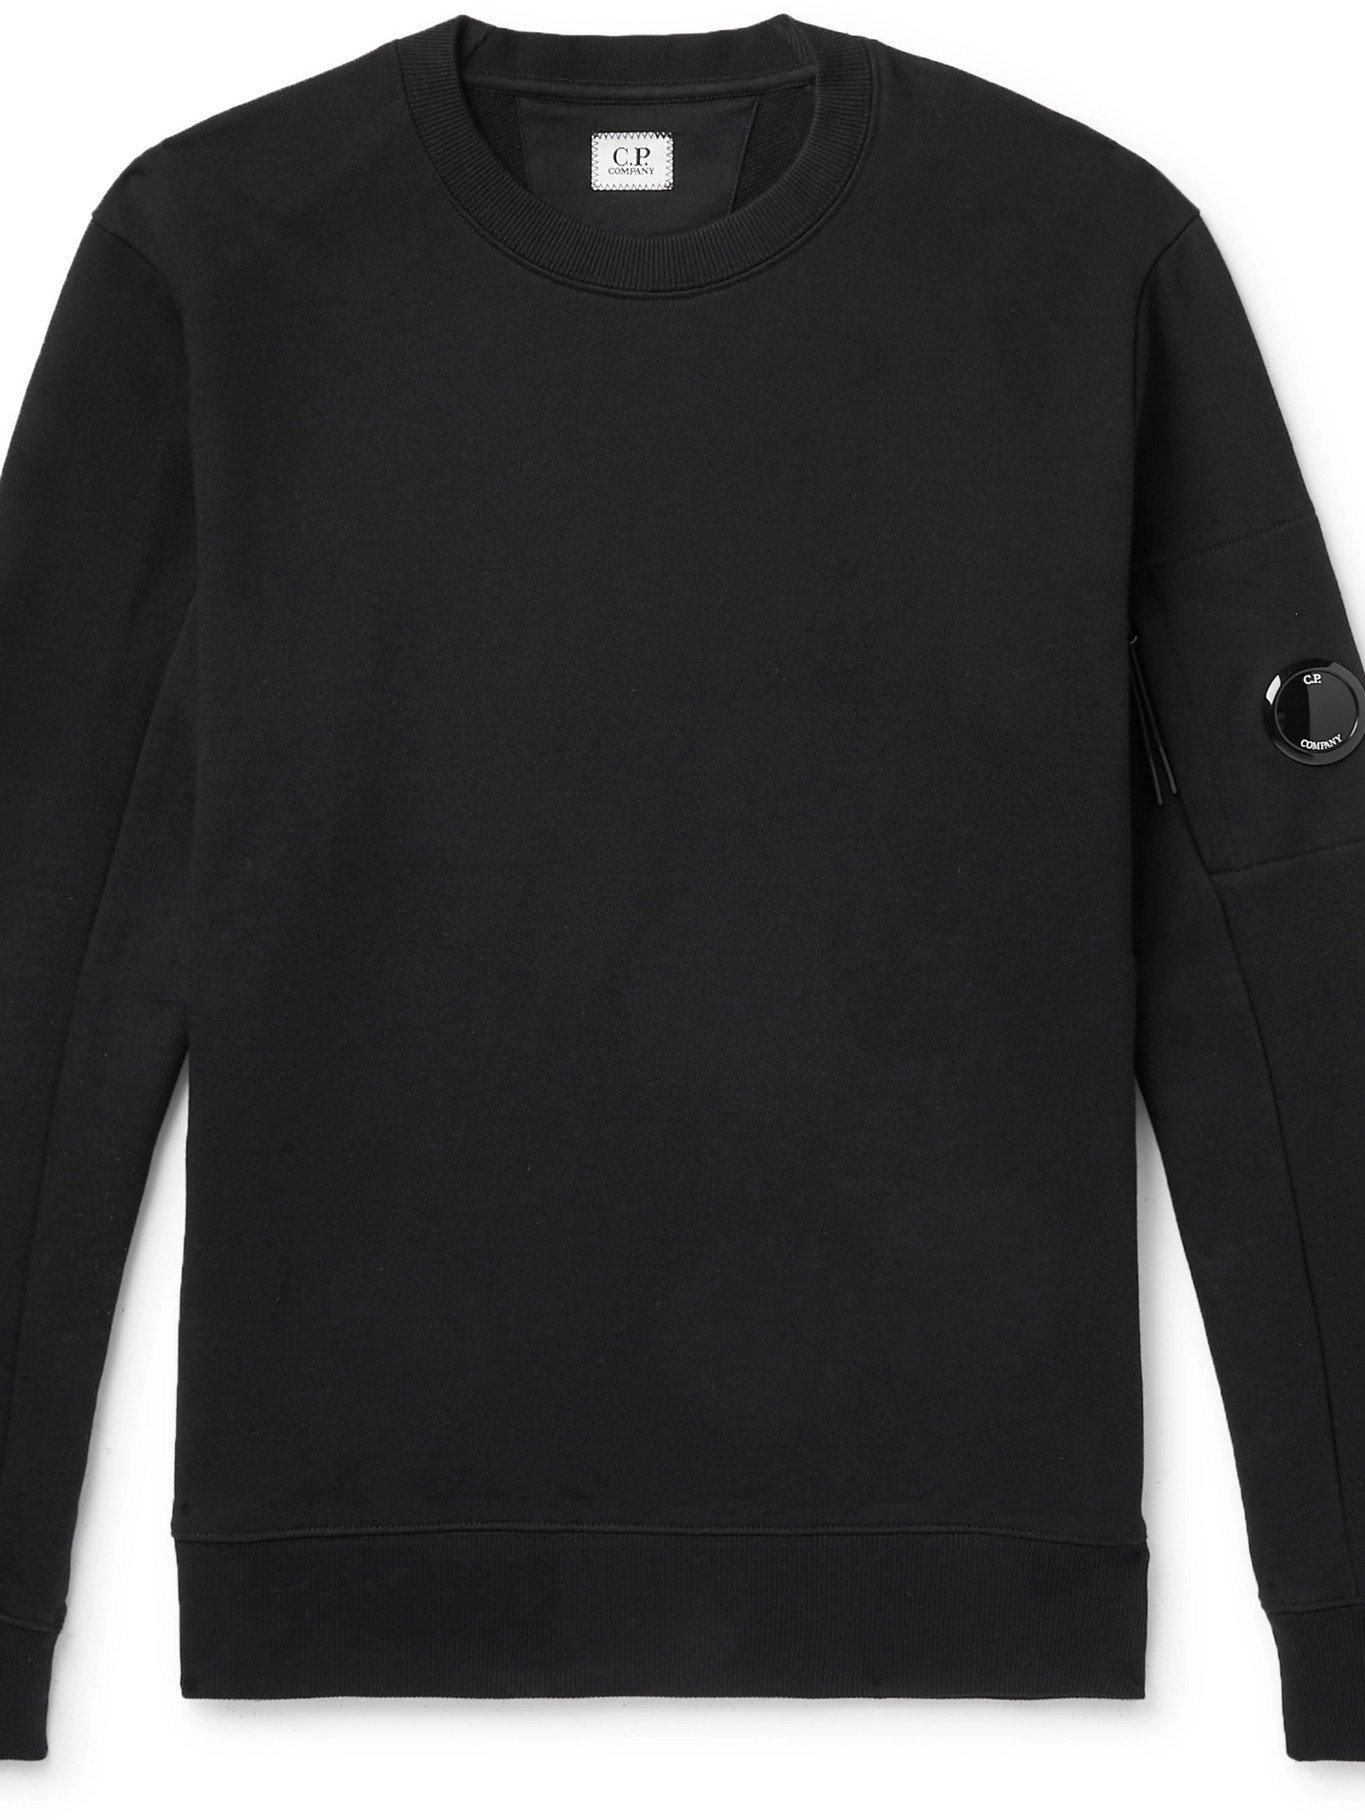 C.P. COMPANY - Logo-Appliquéd Fleece-Back Cotton-Jersey Sweatshirt - Black - L